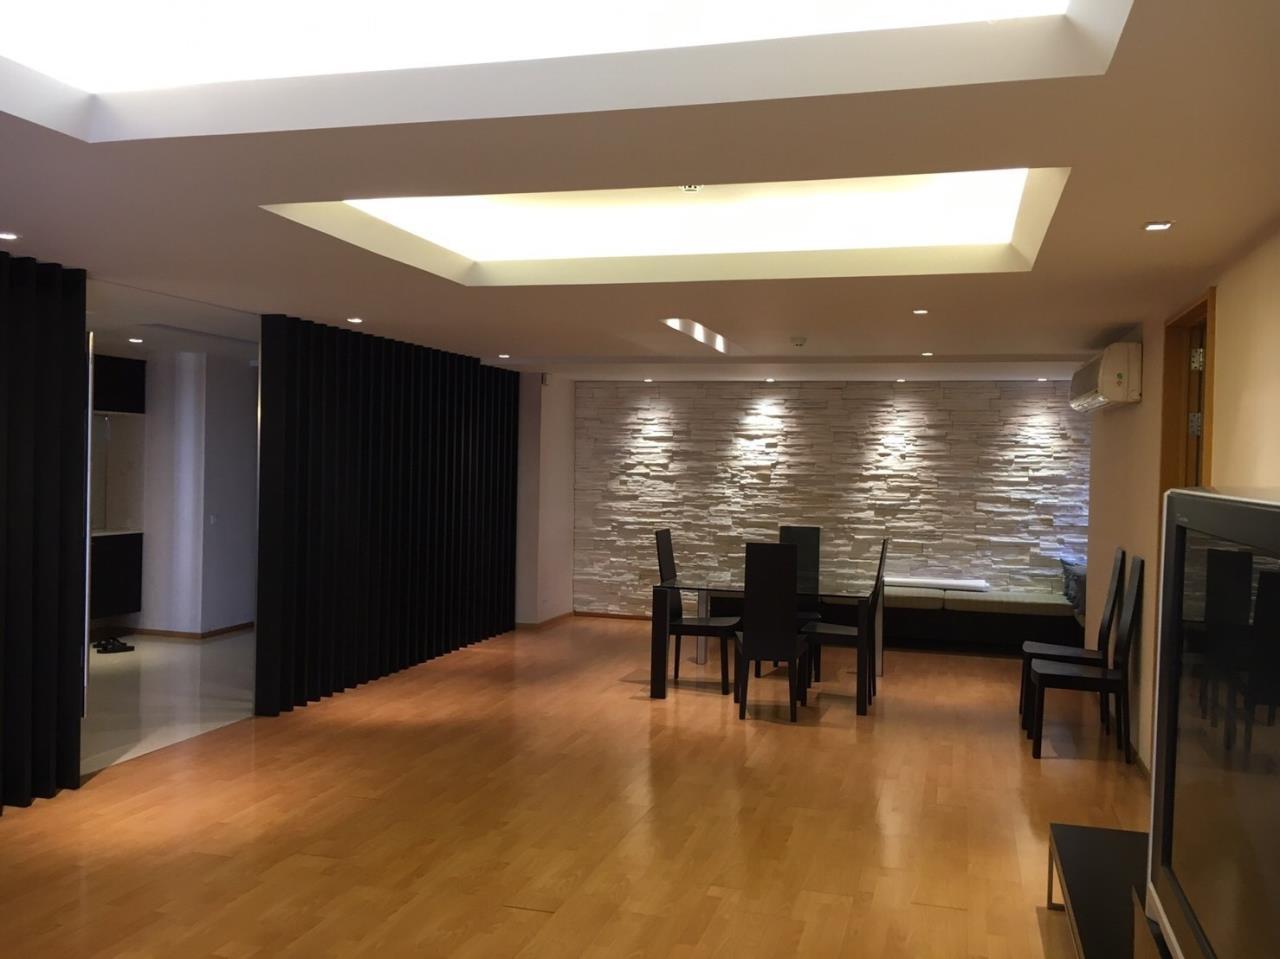 Piri Property Agency's Duplex Penthouse with 4 Bedrooms in Ekkamai - 27th Floor 1